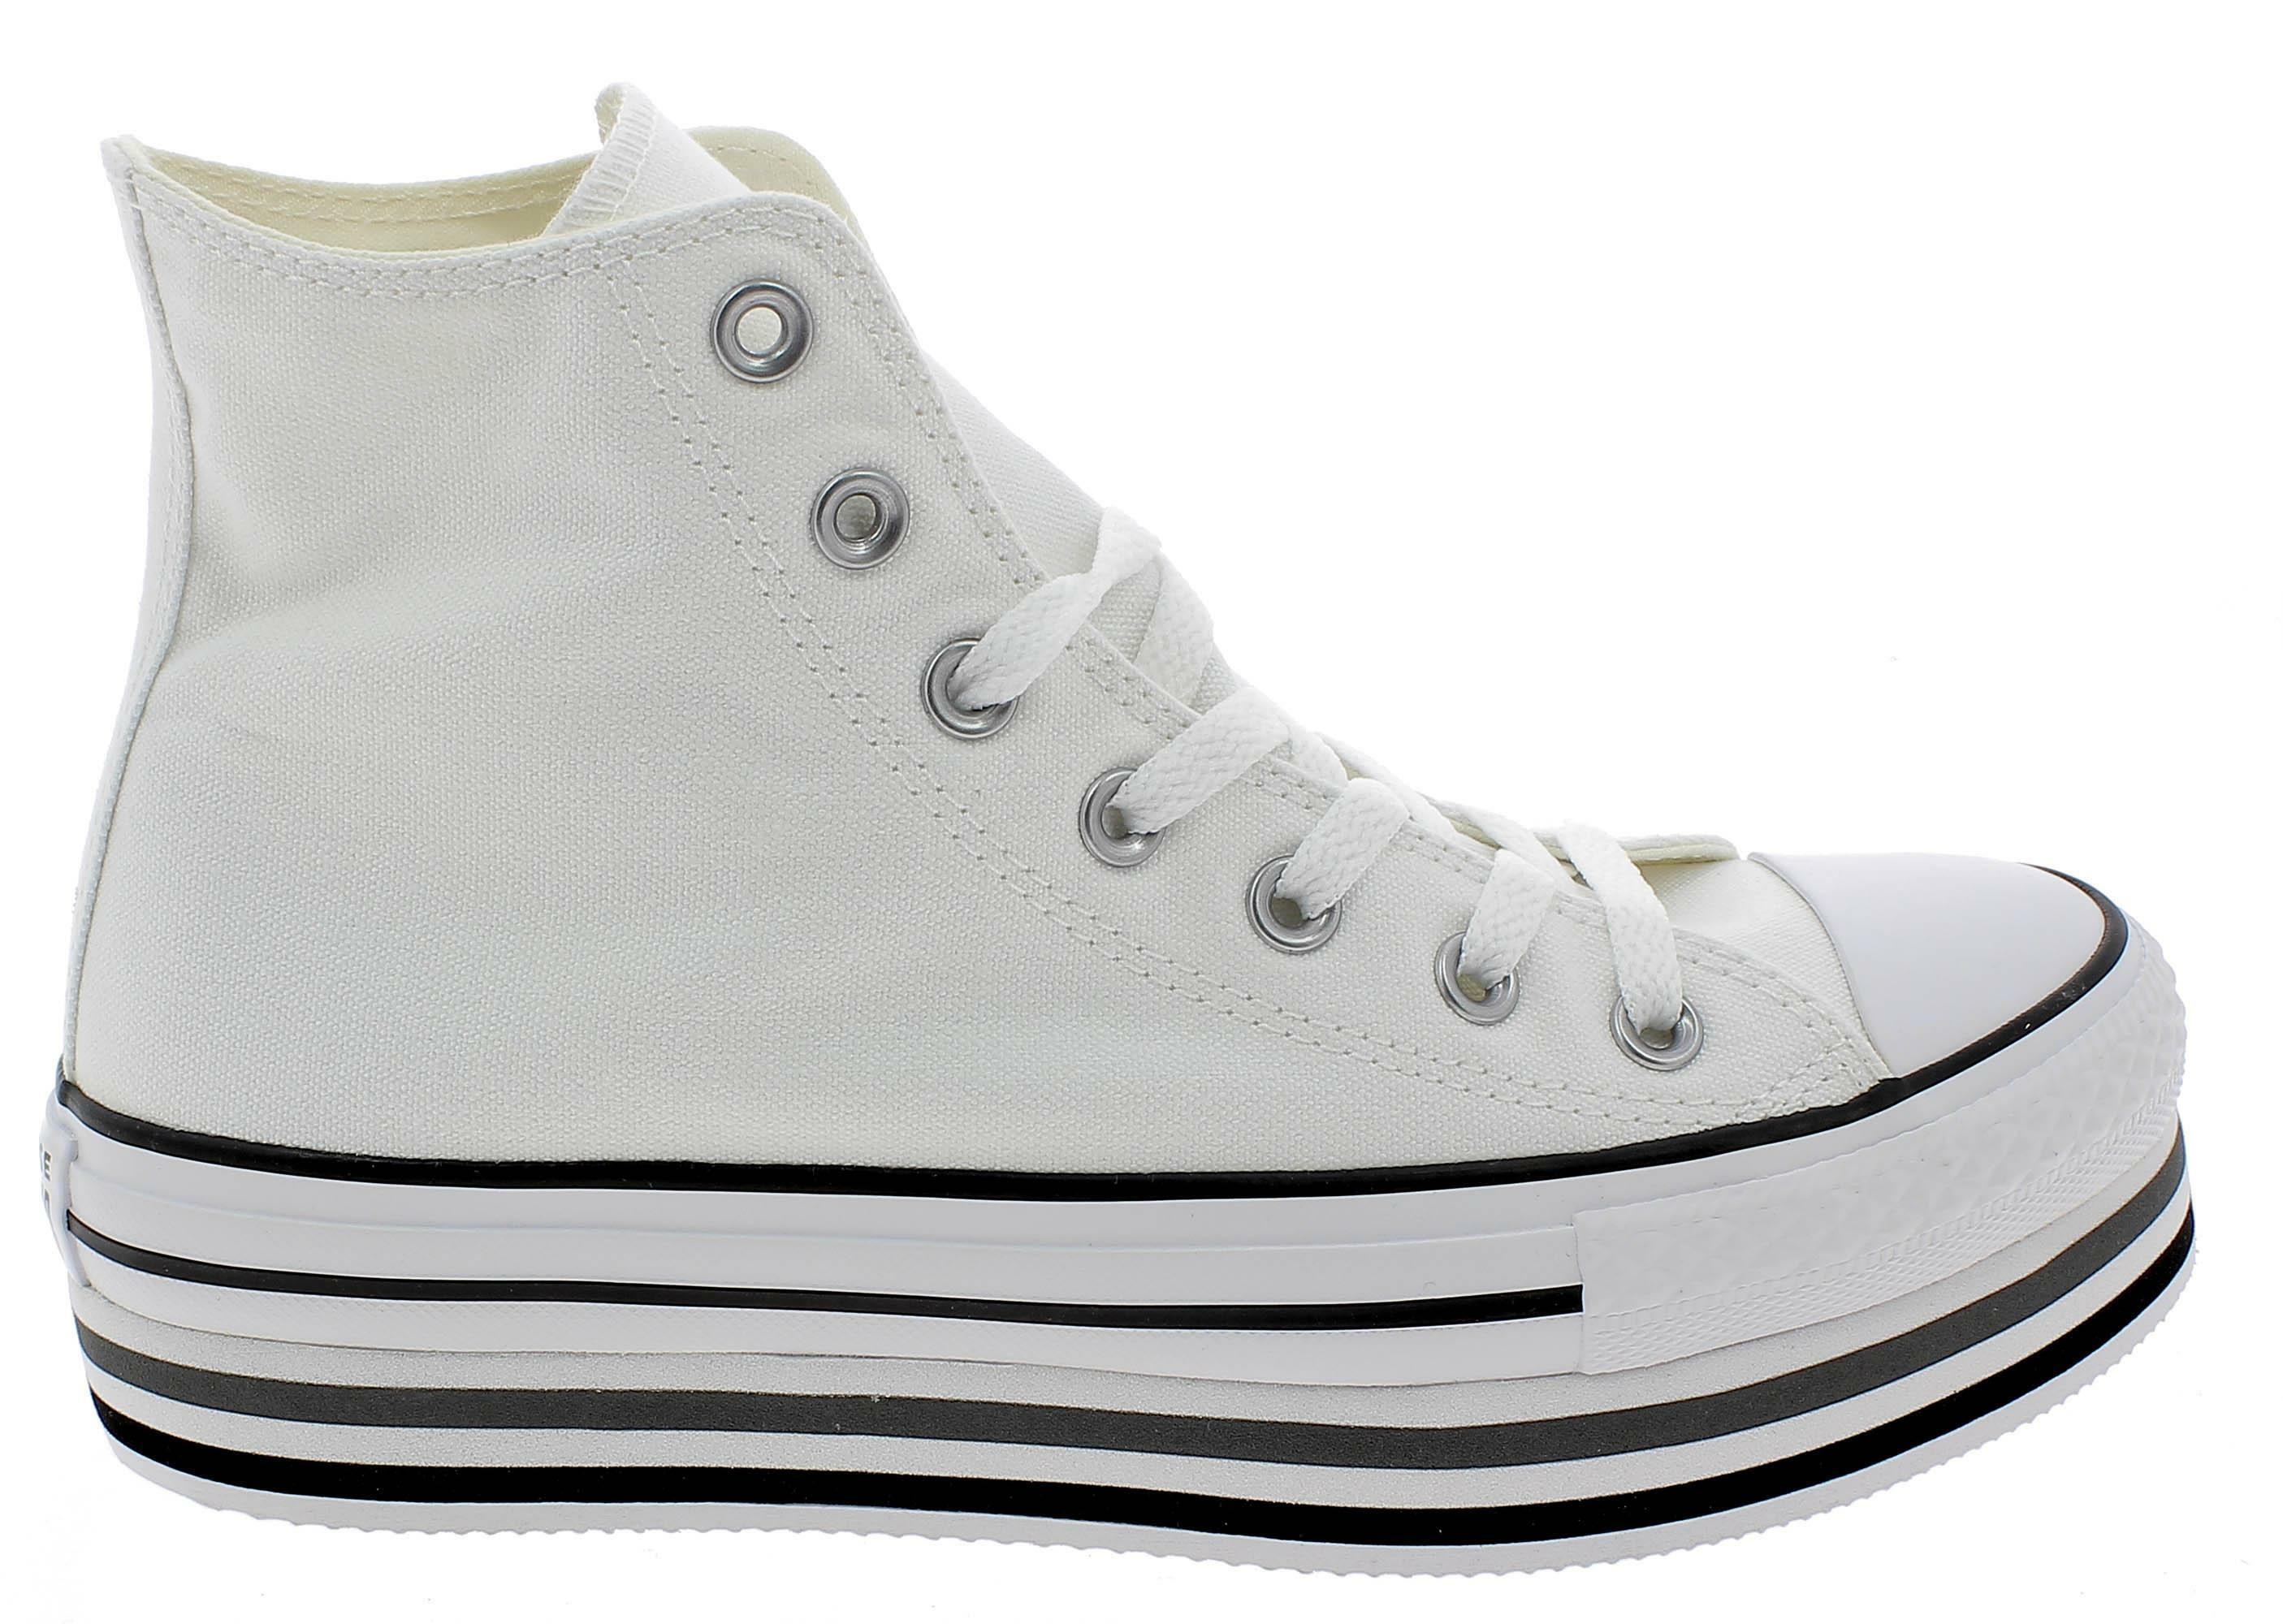 Converse ctas platform layer hi scarpe sportive donna bianche 564485c